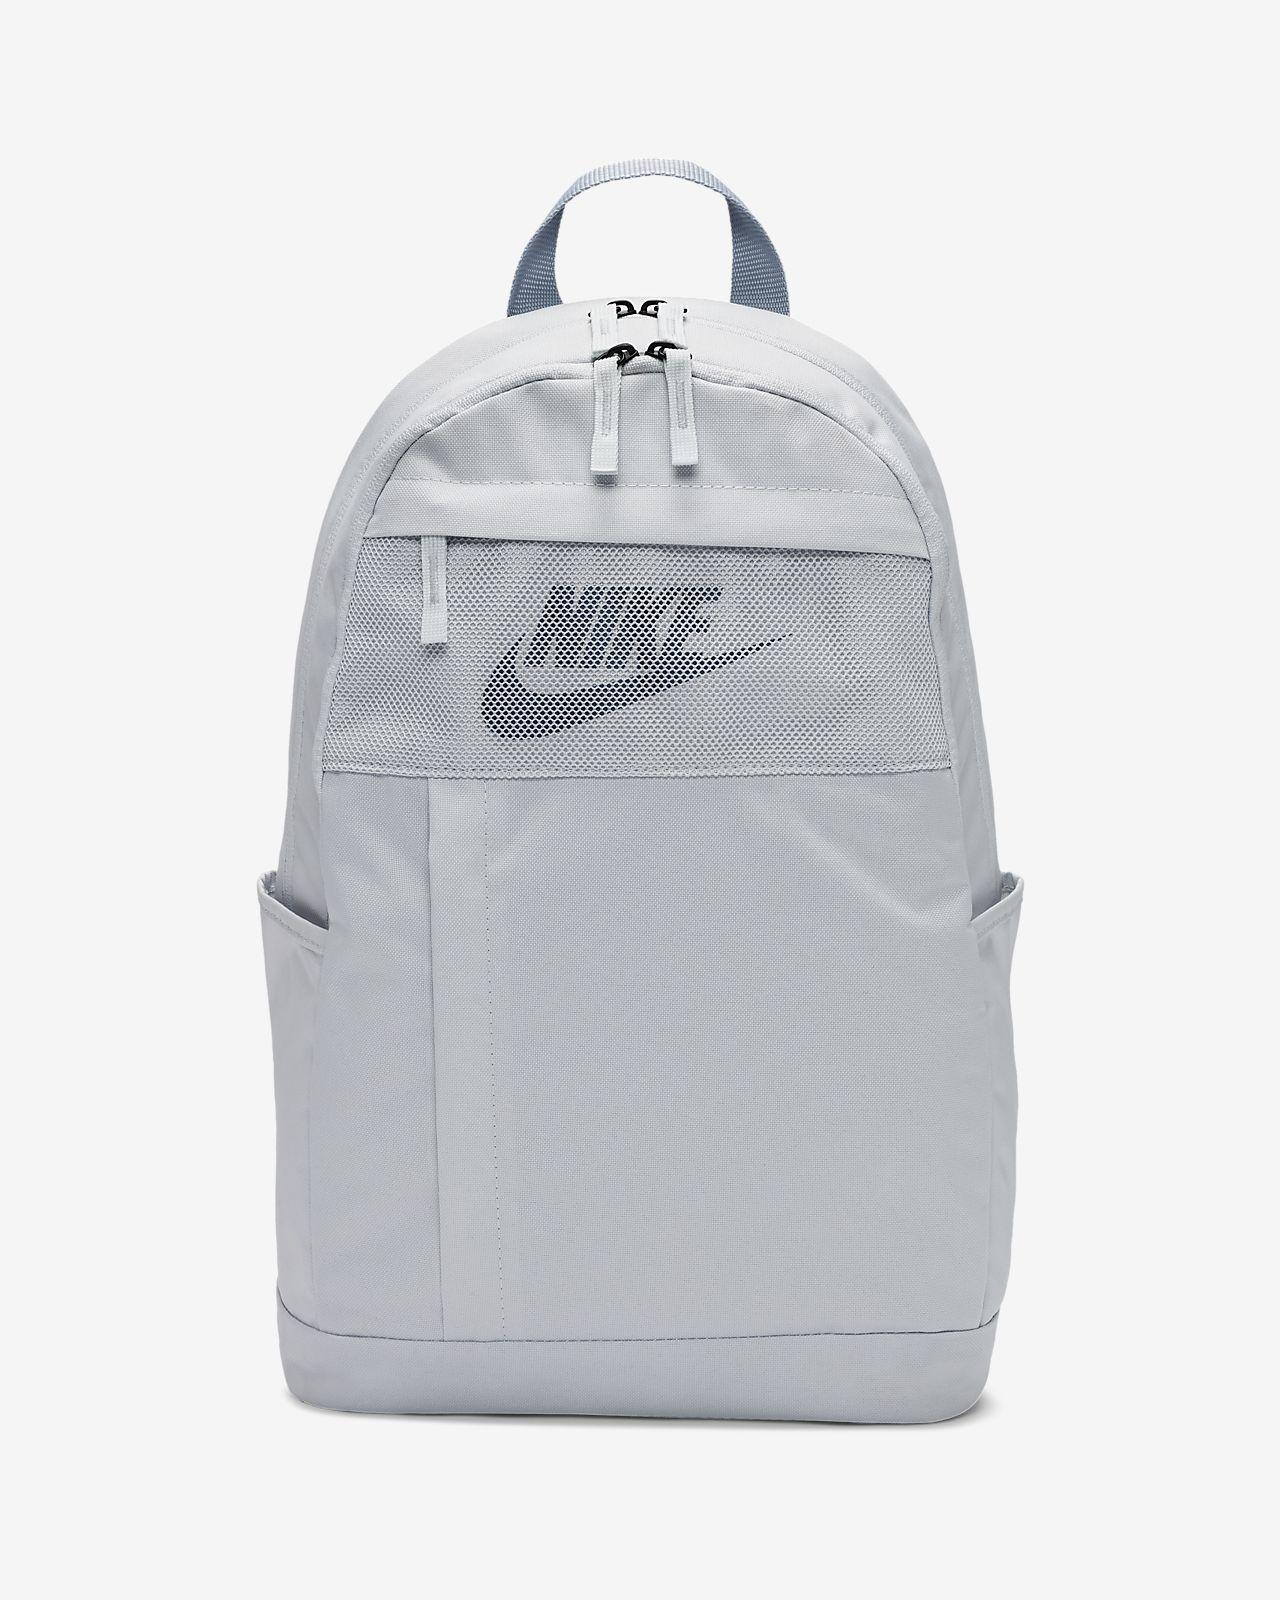 Nike Elemental LBR 双肩包